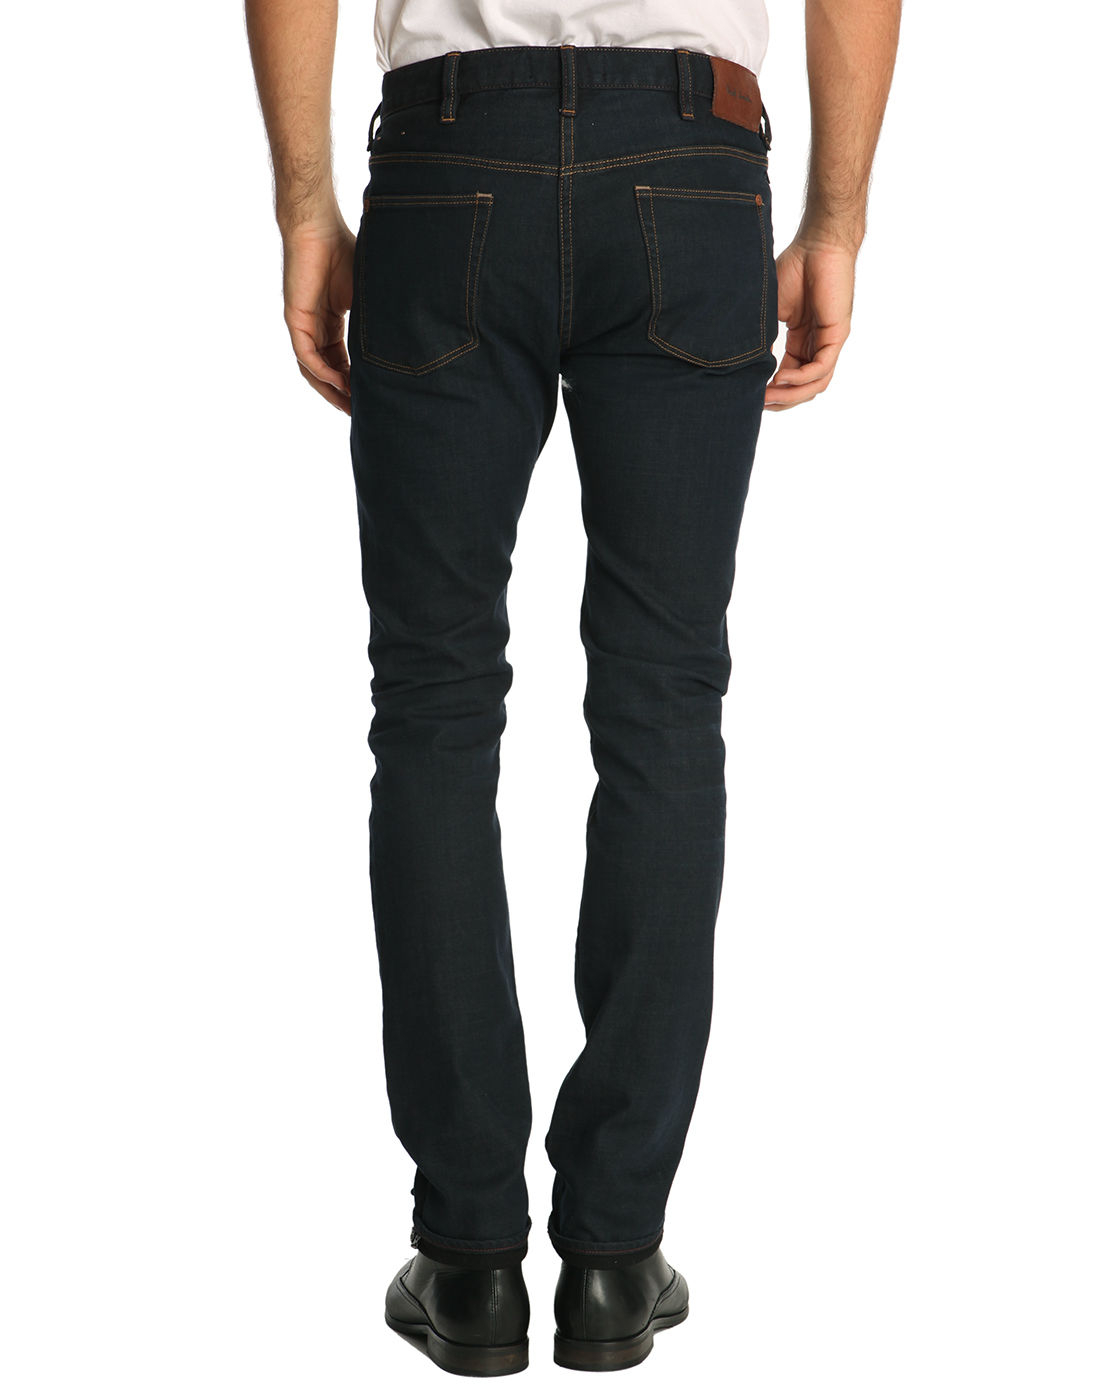 paul smith regular slim fit raw jeans in blue for men lyst. Black Bedroom Furniture Sets. Home Design Ideas